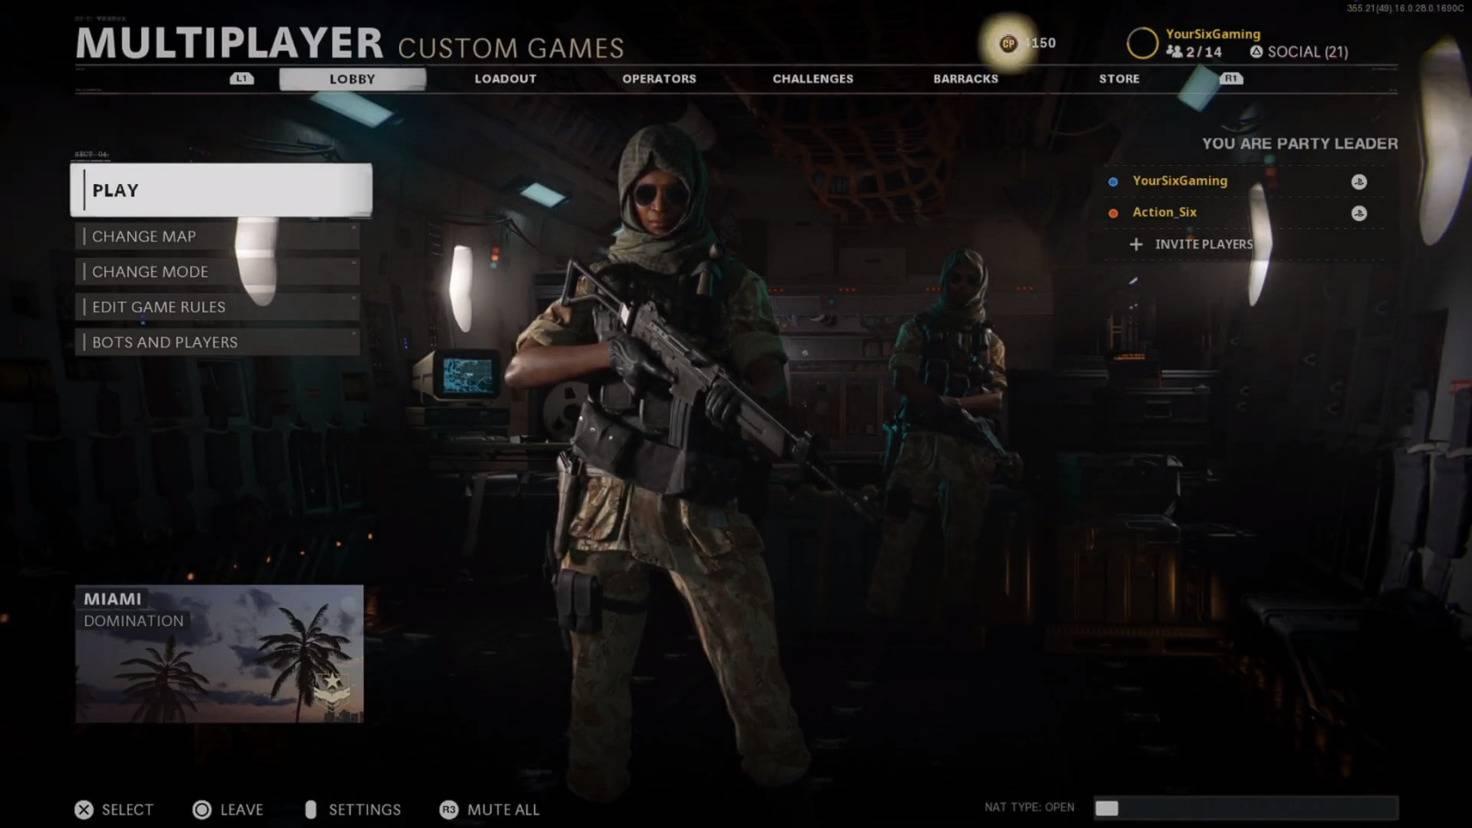 Call-of-duty-black-ops-cold-war-spltscreen-lobby